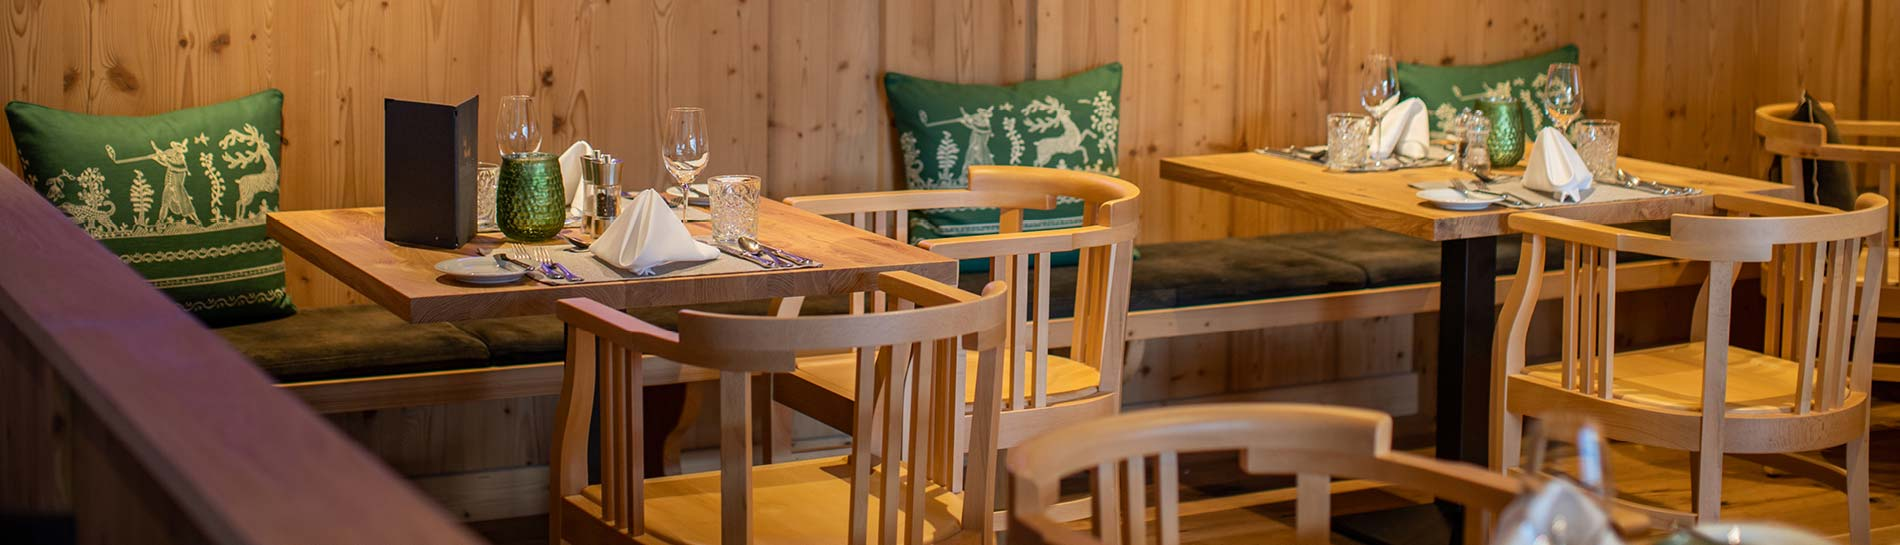 Sportresort Alpenblick Hotel Zell am See Austria Keyfotos Niche Destinations 2